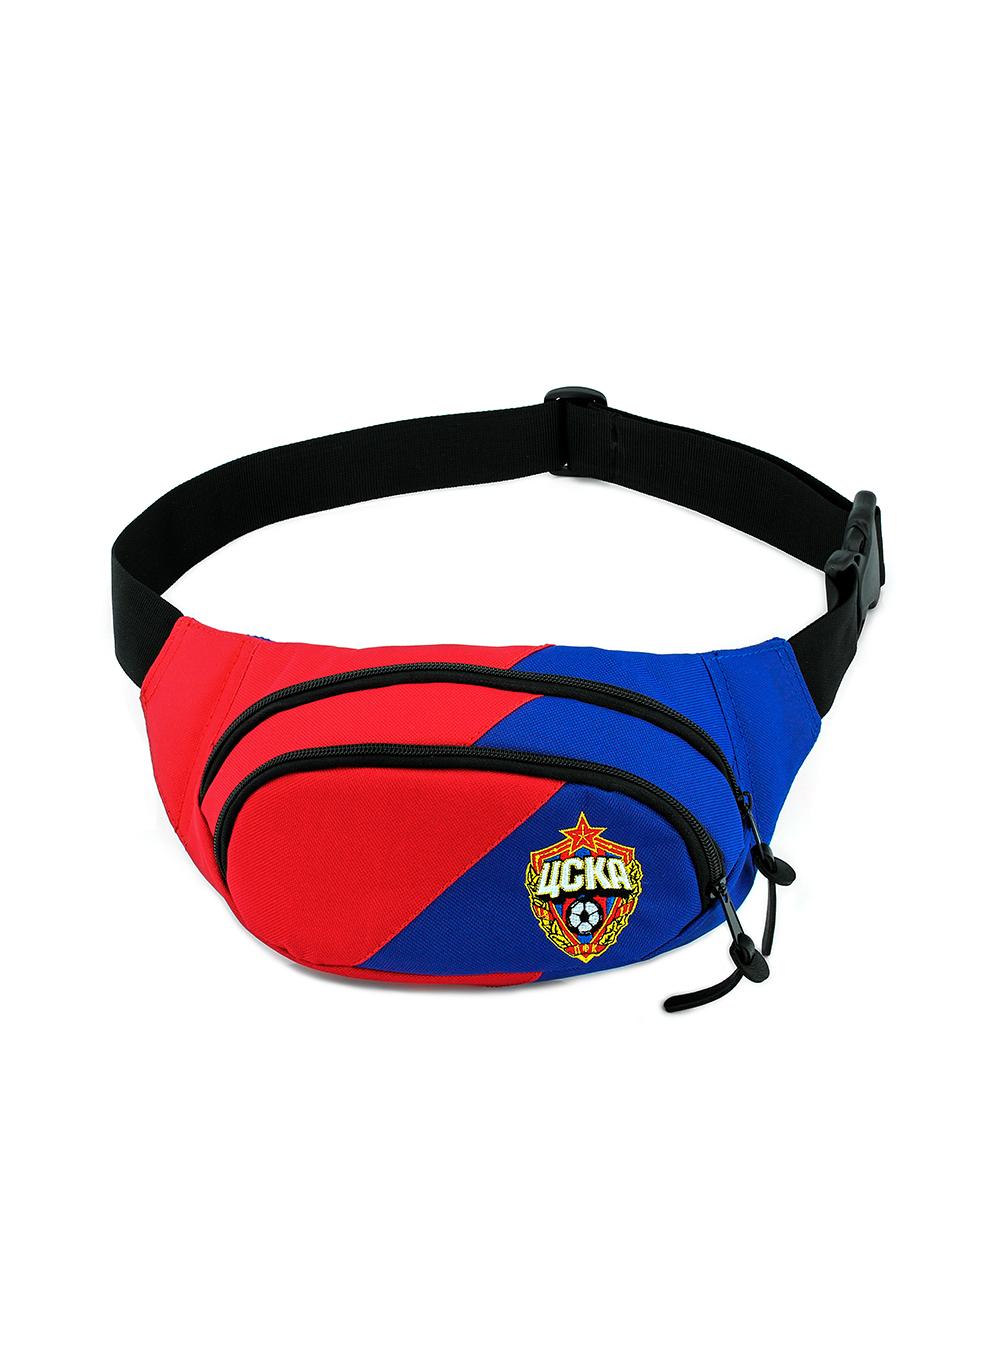 Сумка на пояс красно-синяя с эмблемой ПФК ЦСКА фото